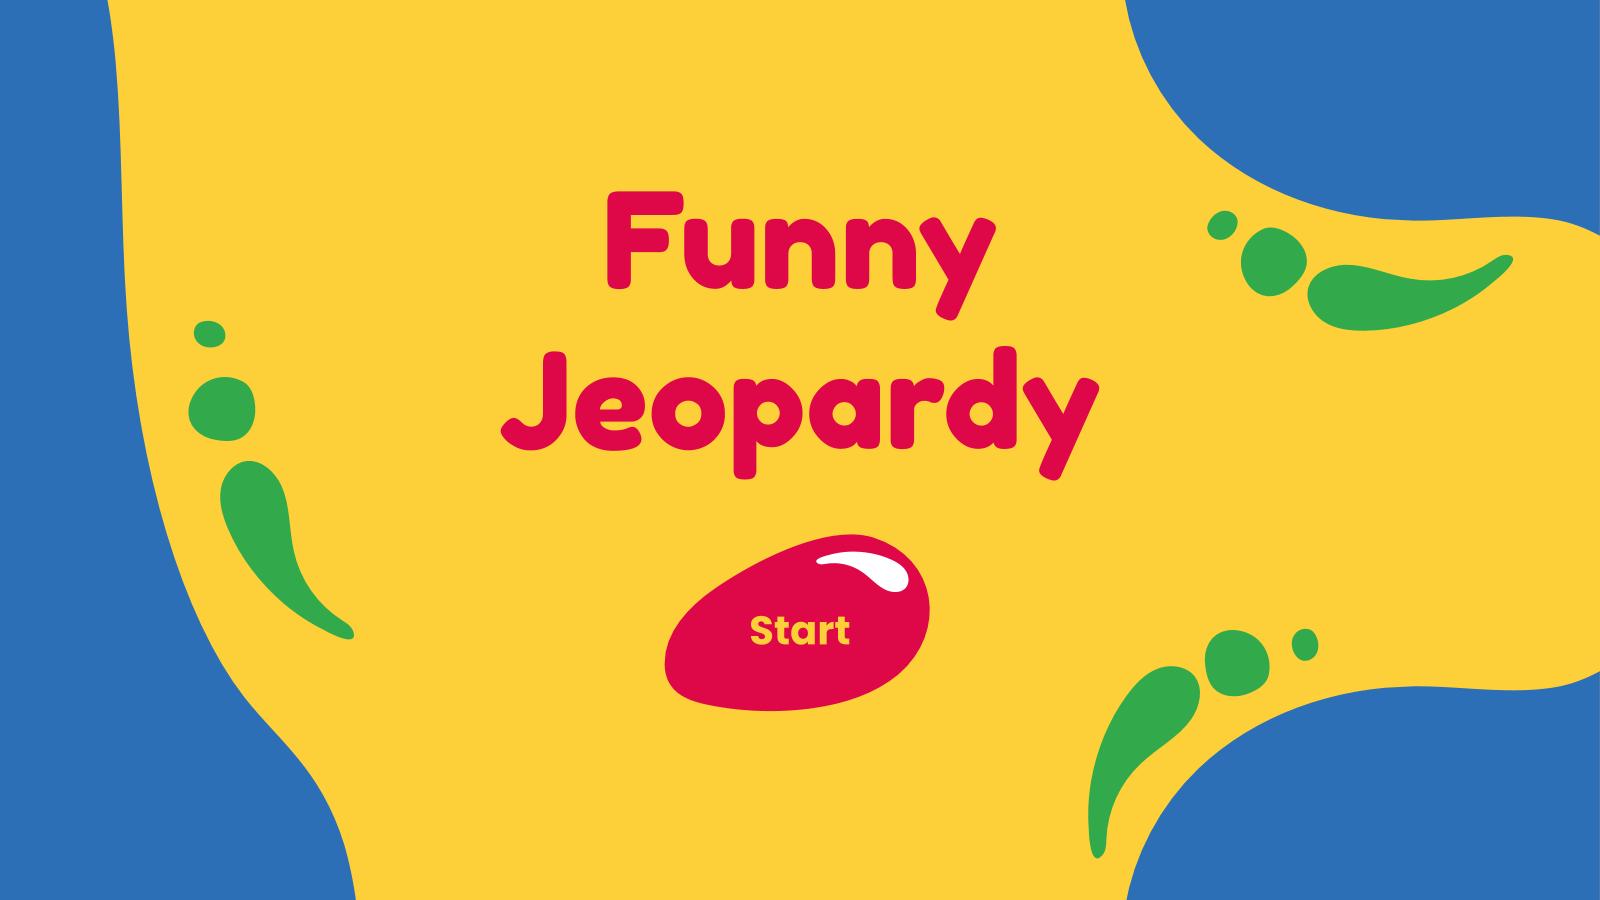 Funny Jeopardy presentation template